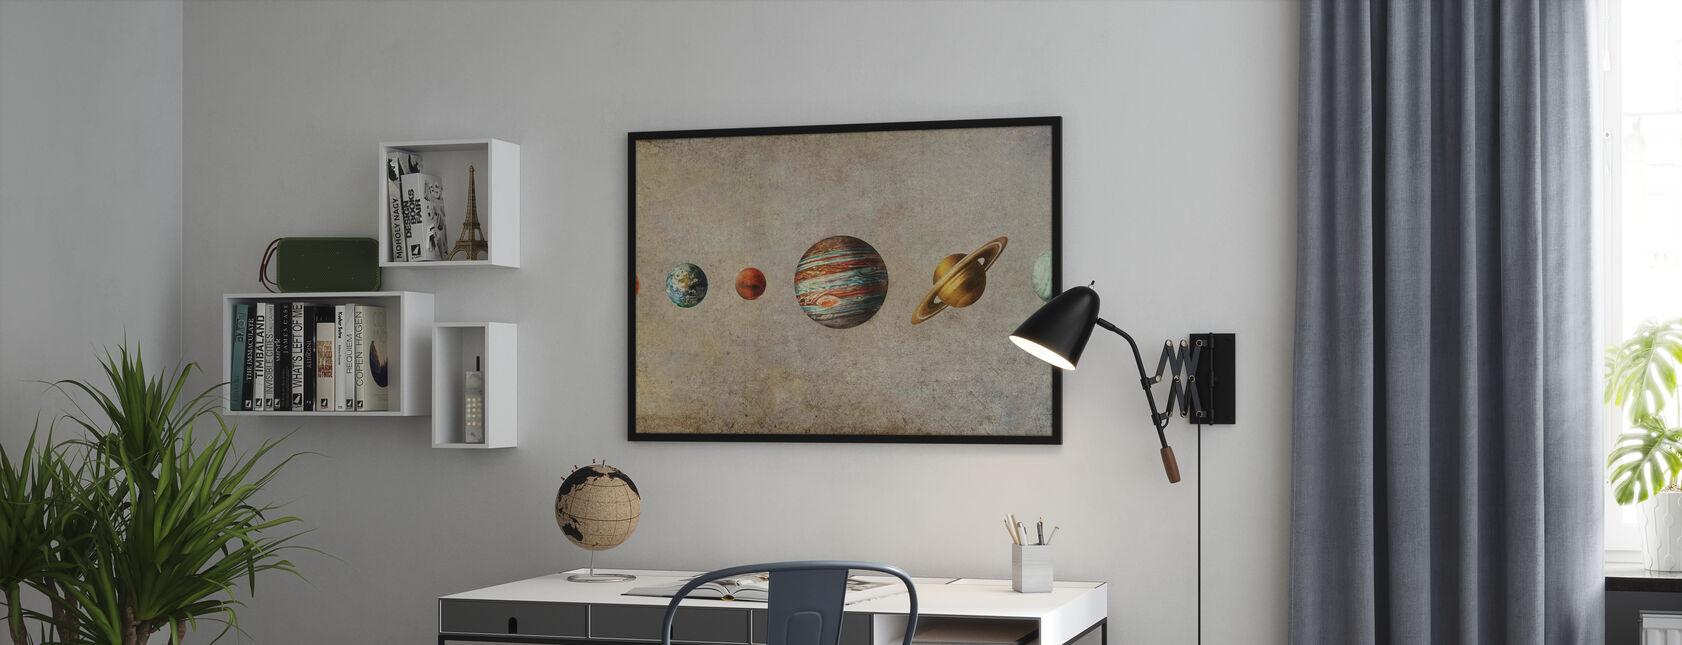 Sonnensystem - Sepia - Gerahmtes bild - Büro